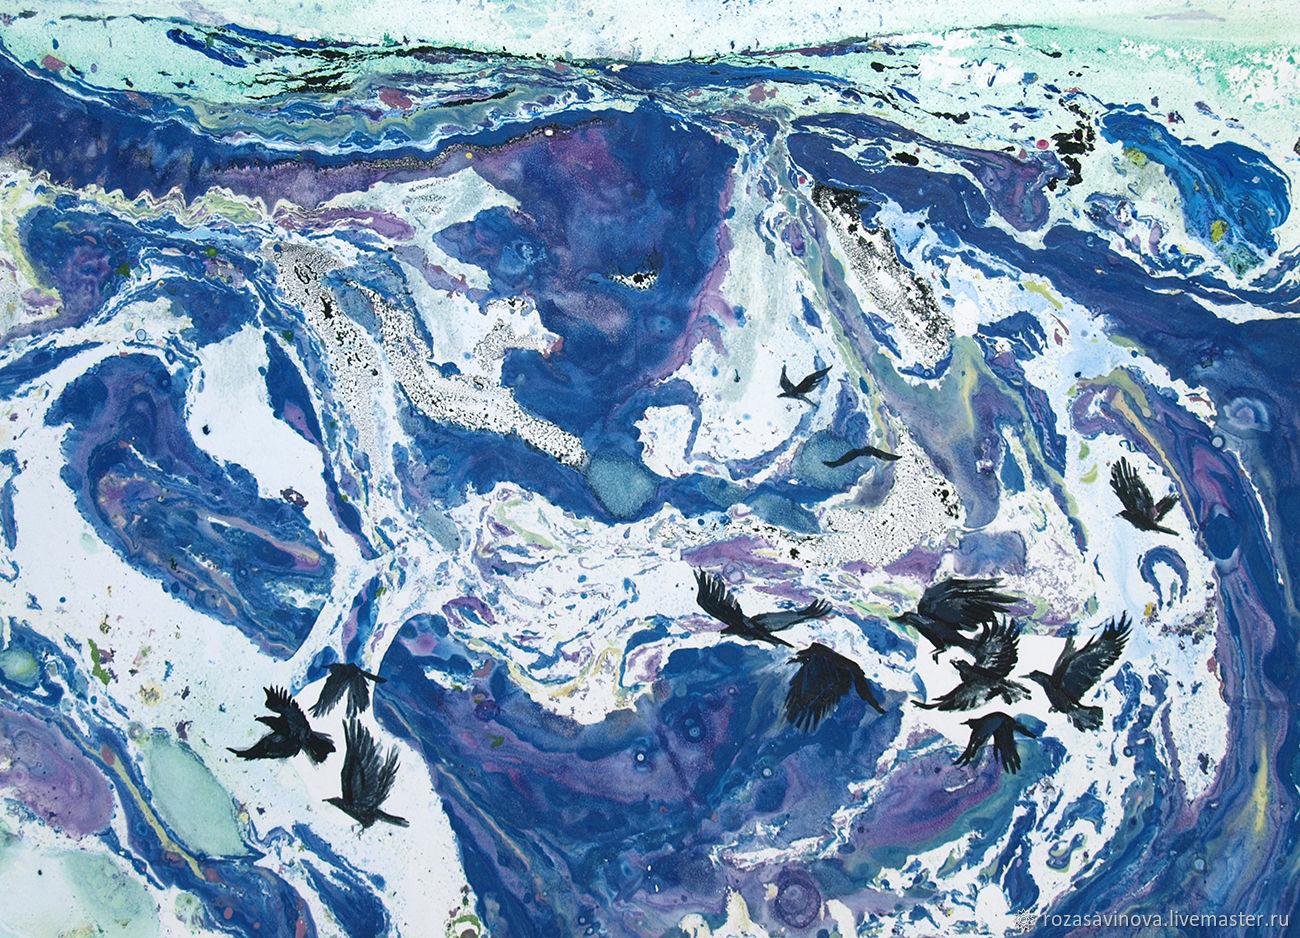 Картина Еще в полях белеет снег. Графика. Смешанная техника, Картины, Магнитогорск,  Фото №1